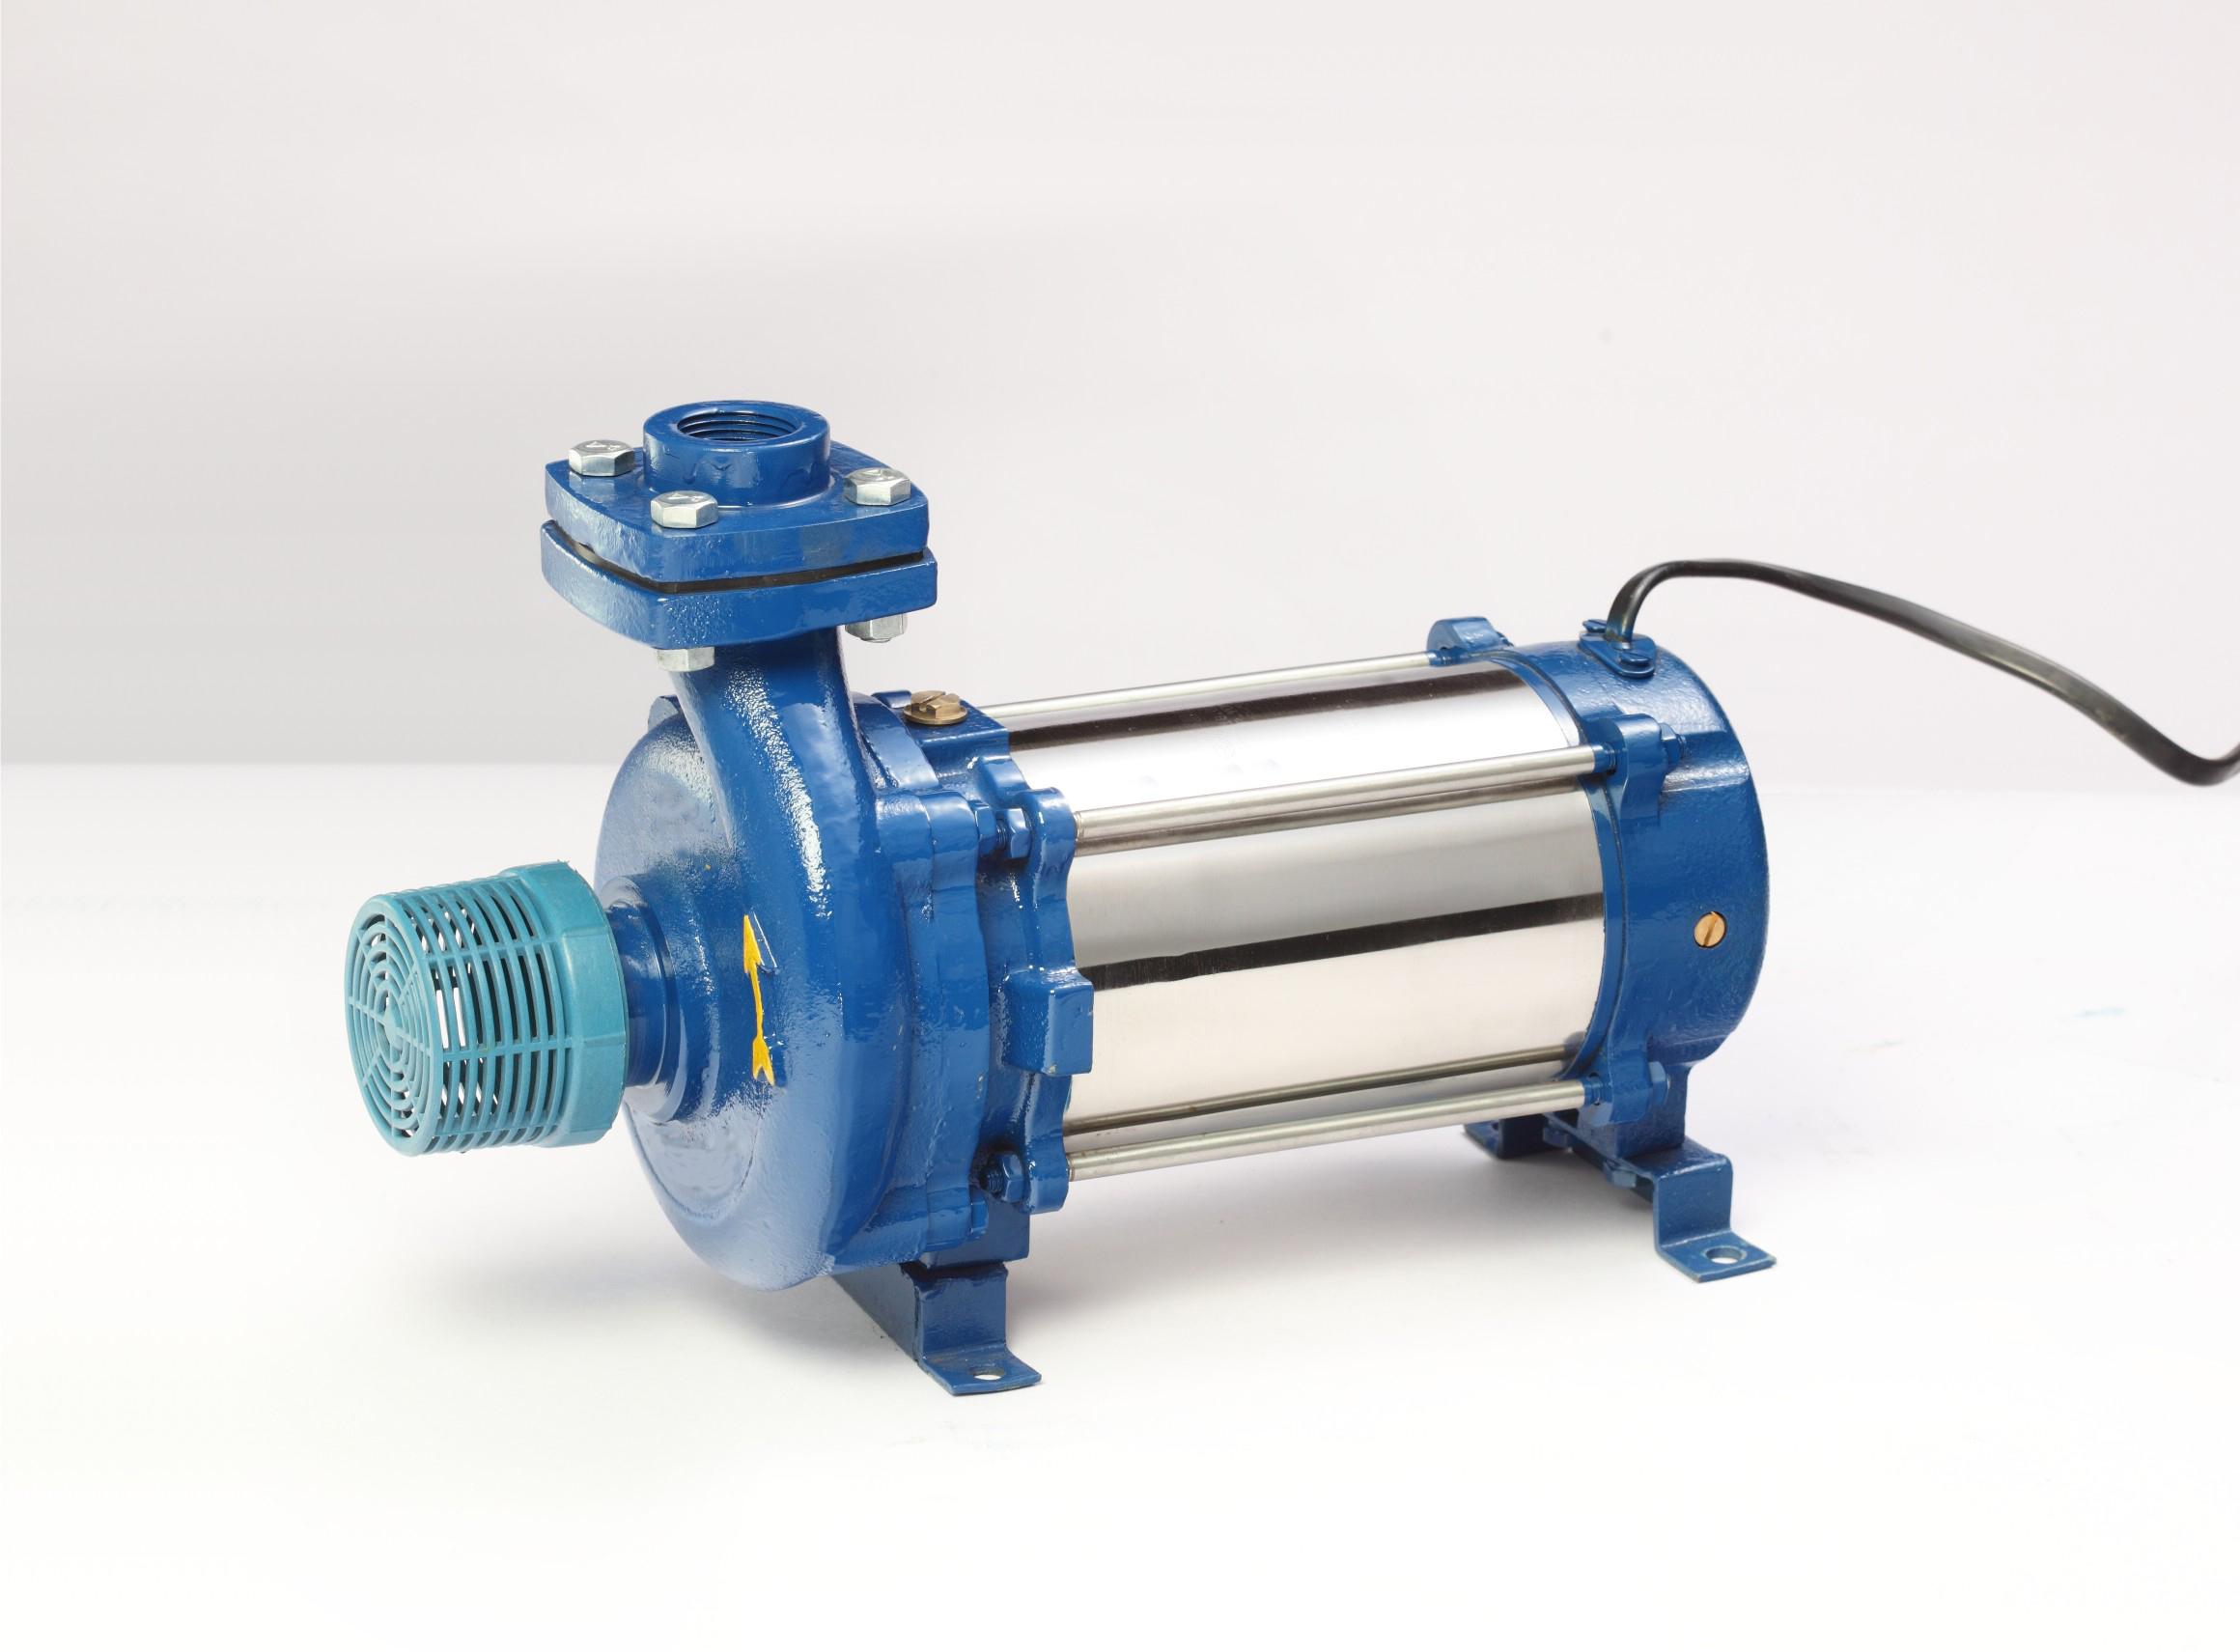 Maruti Submersible Pumps